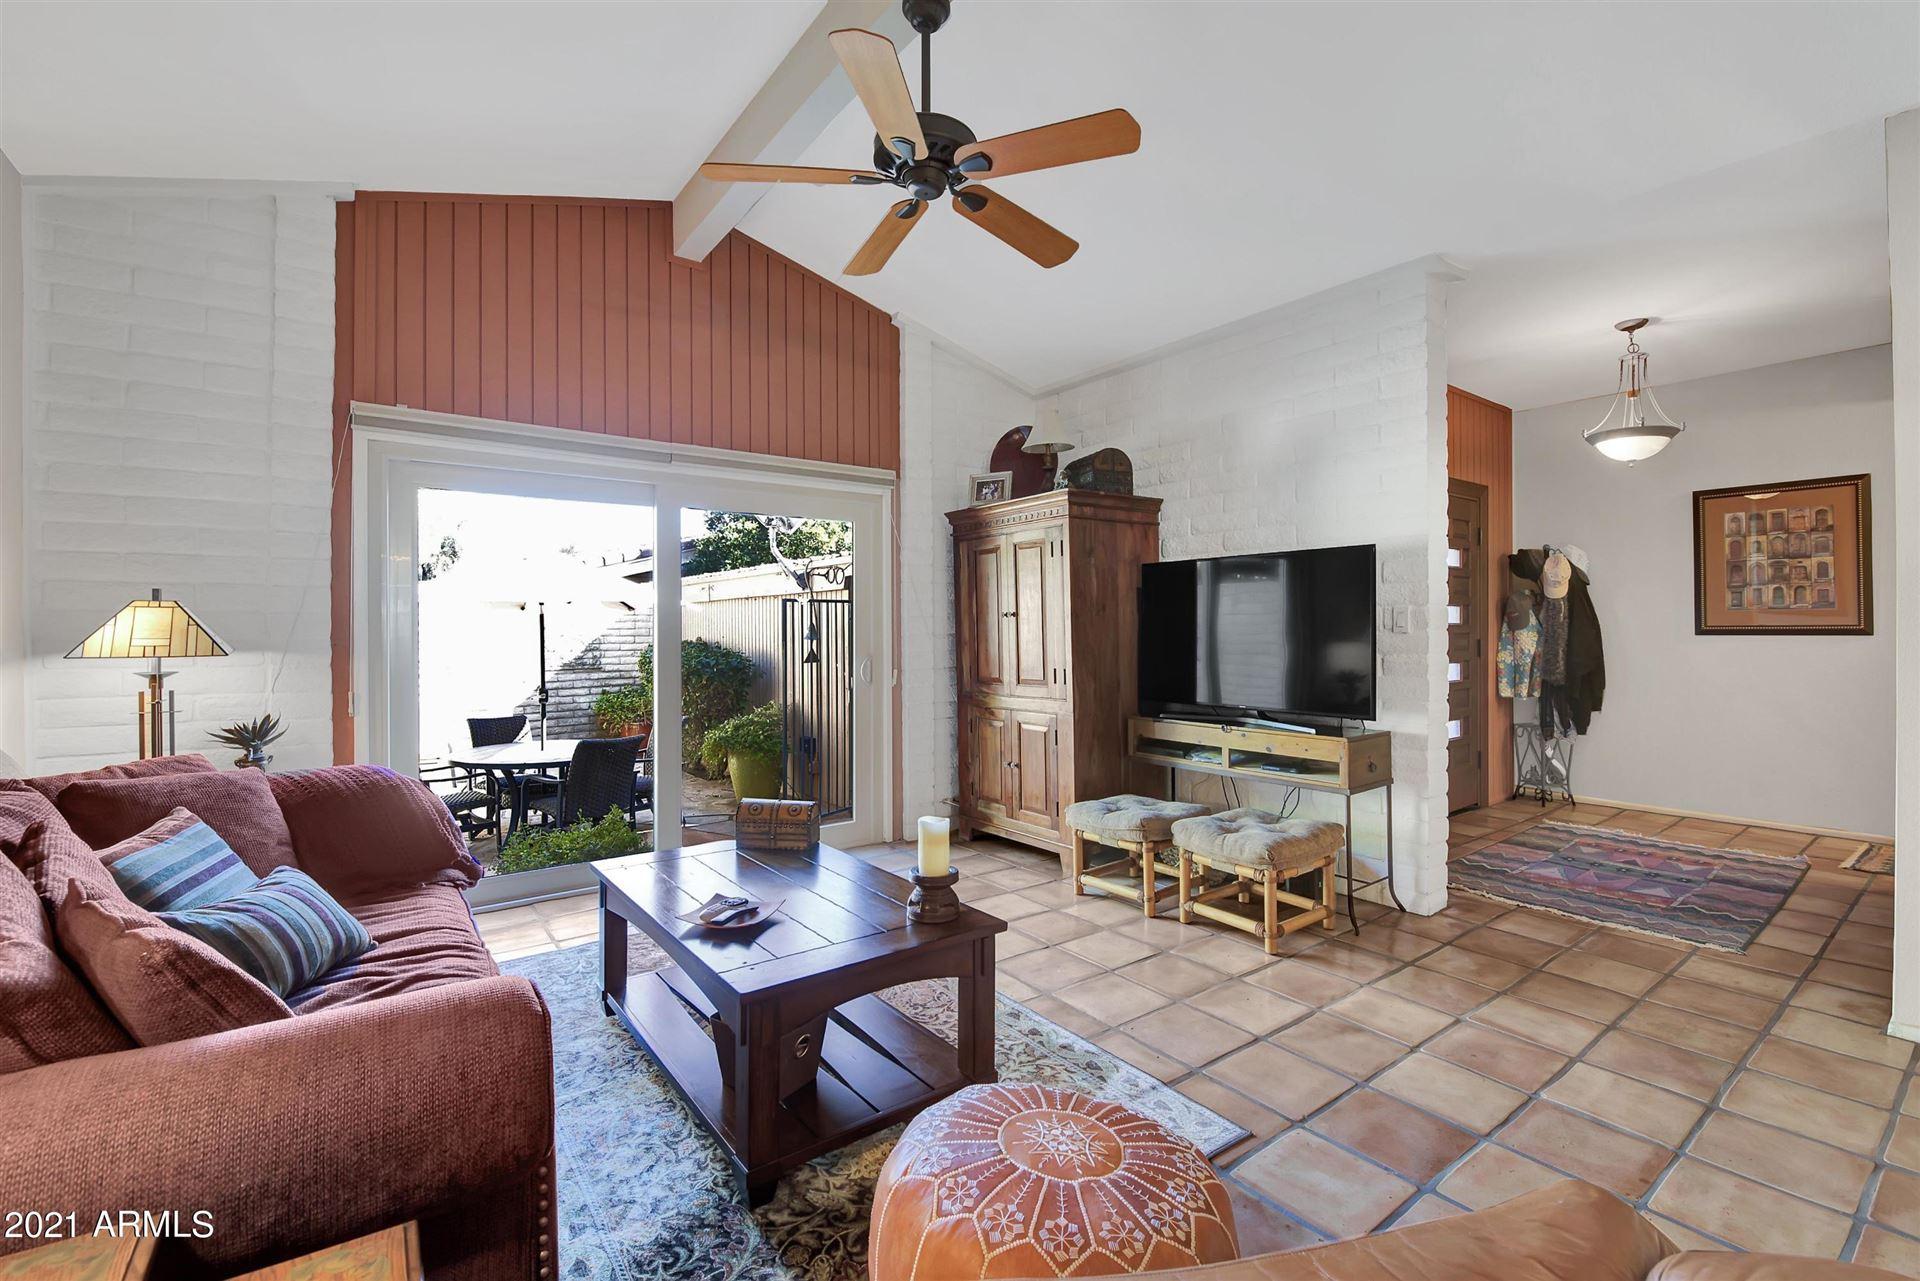 Photo of 4525 N 66TH Street #6, Scottsdale, AZ 85251 (MLS # 6201675)